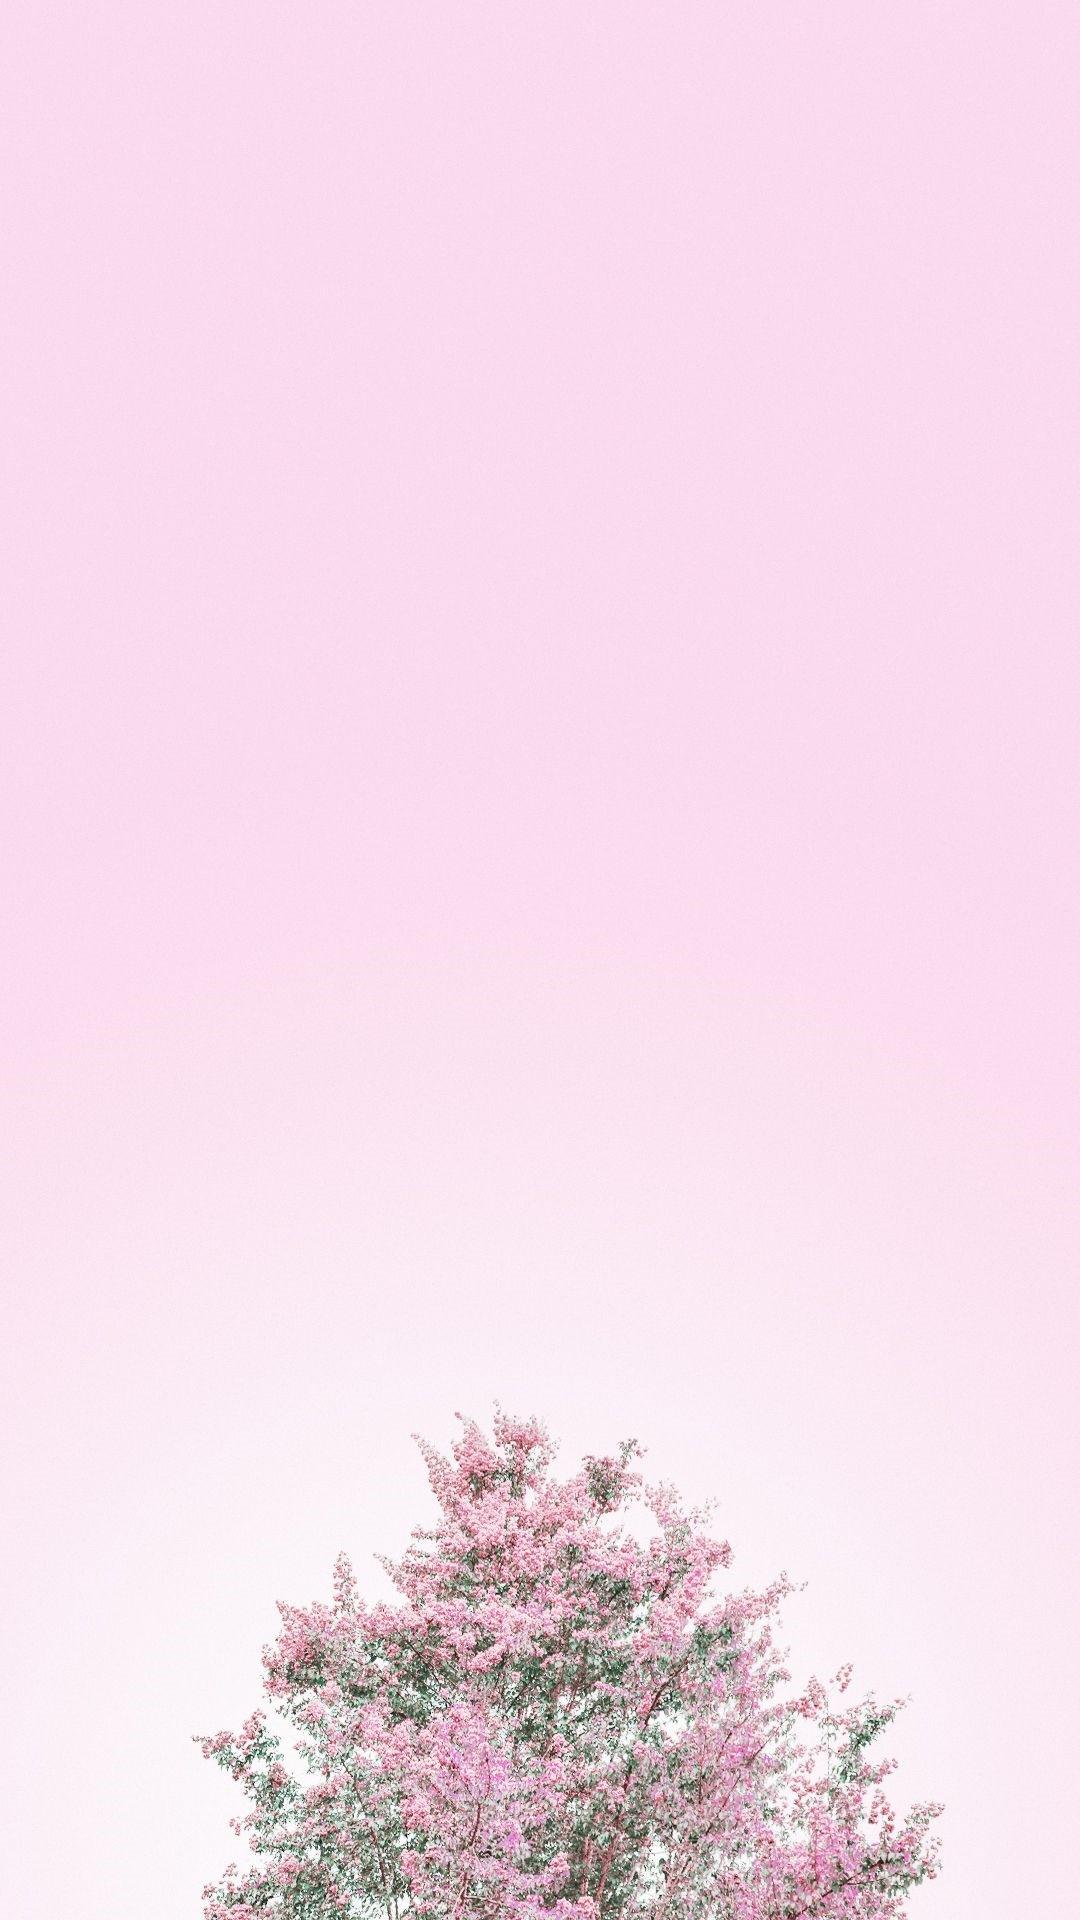 Pastel iPhone 5 wallpaper